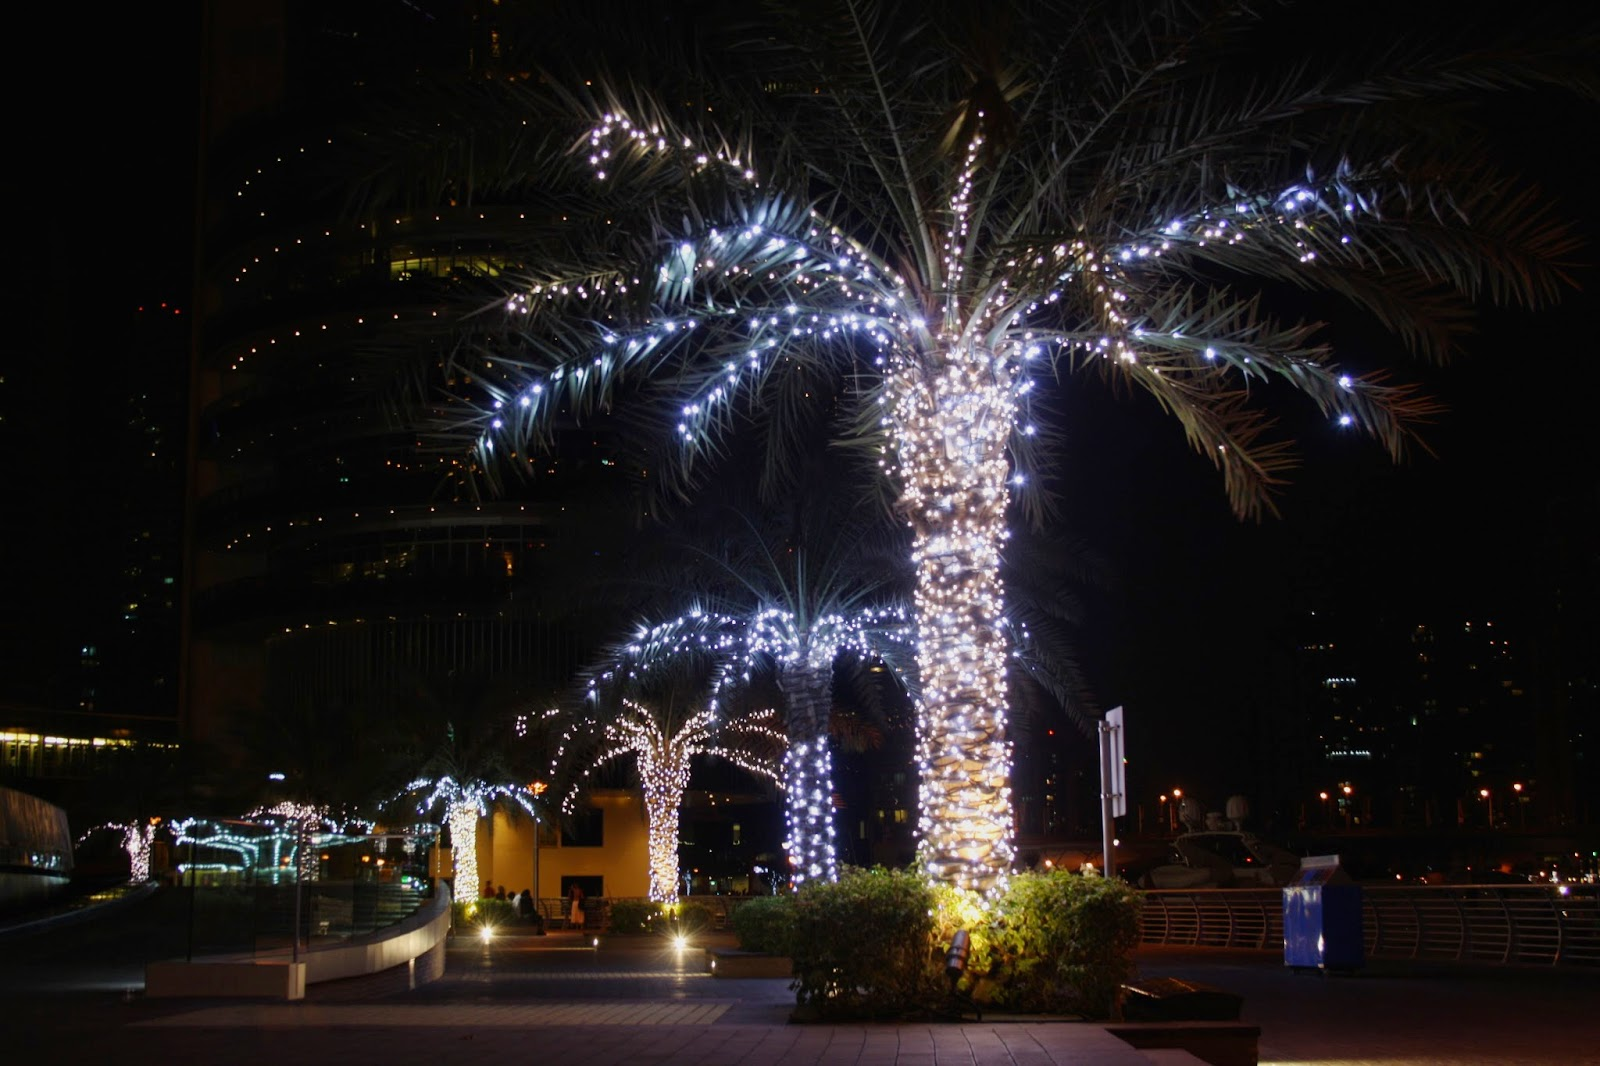 DUBAI PHOTO DIARY I. 9